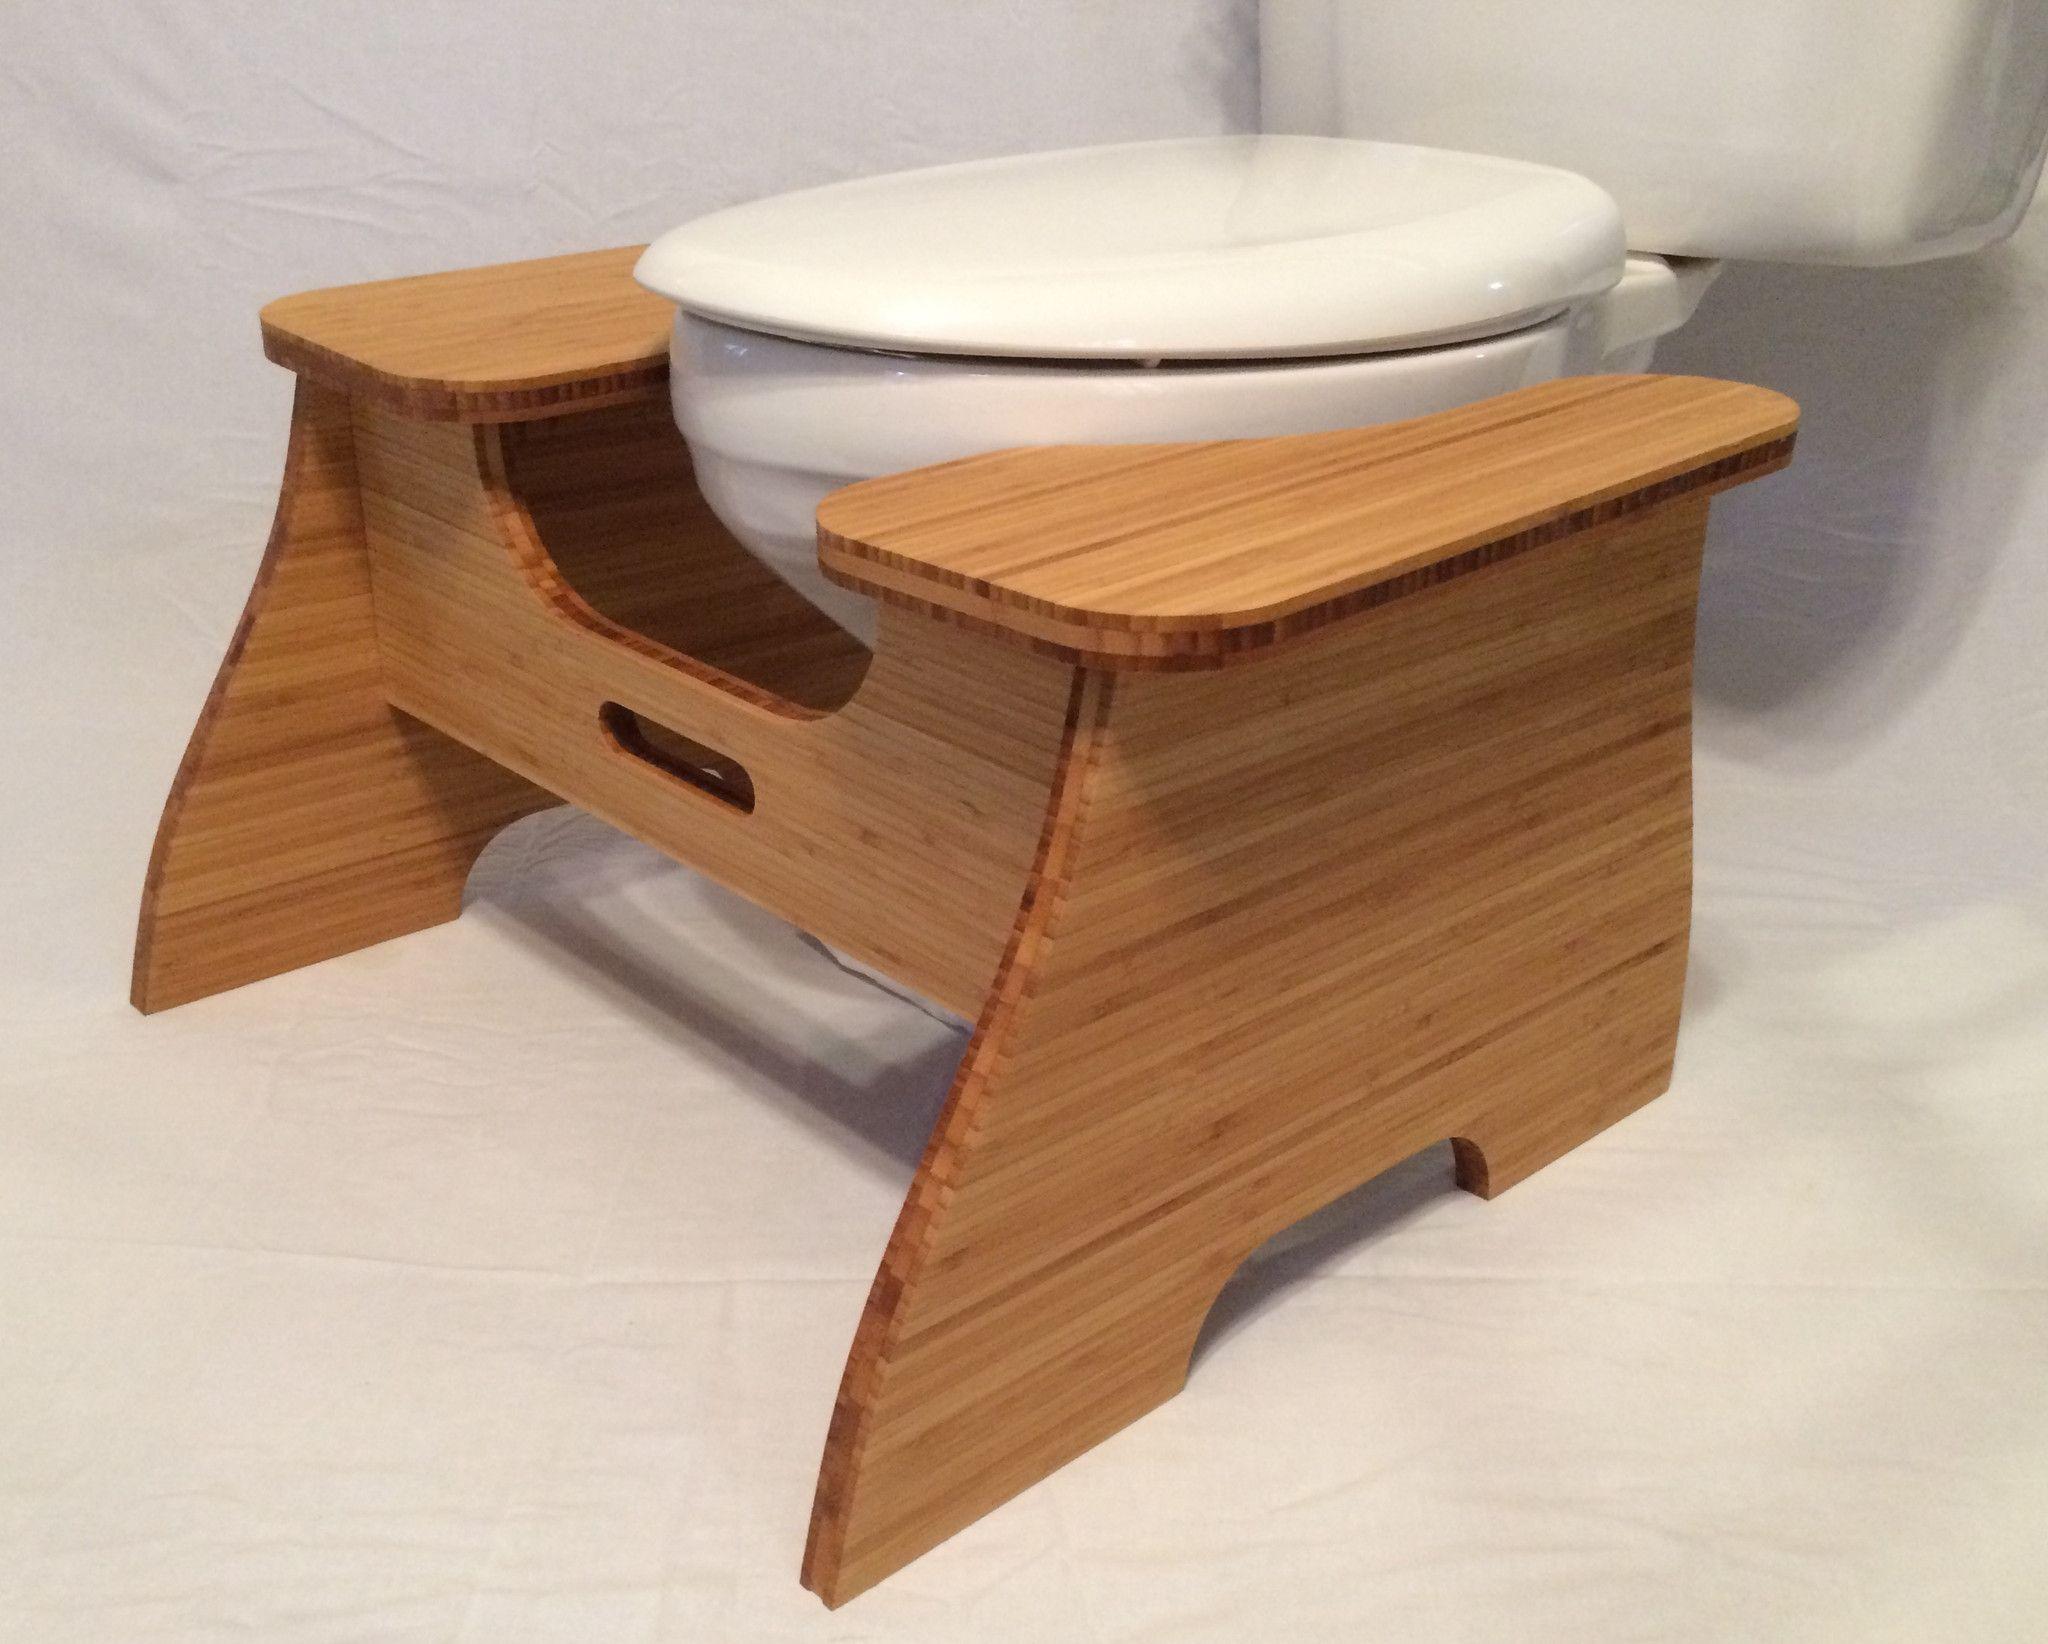 High Bamboo Poop Stoop Full Squat Toilet Foot Stool O